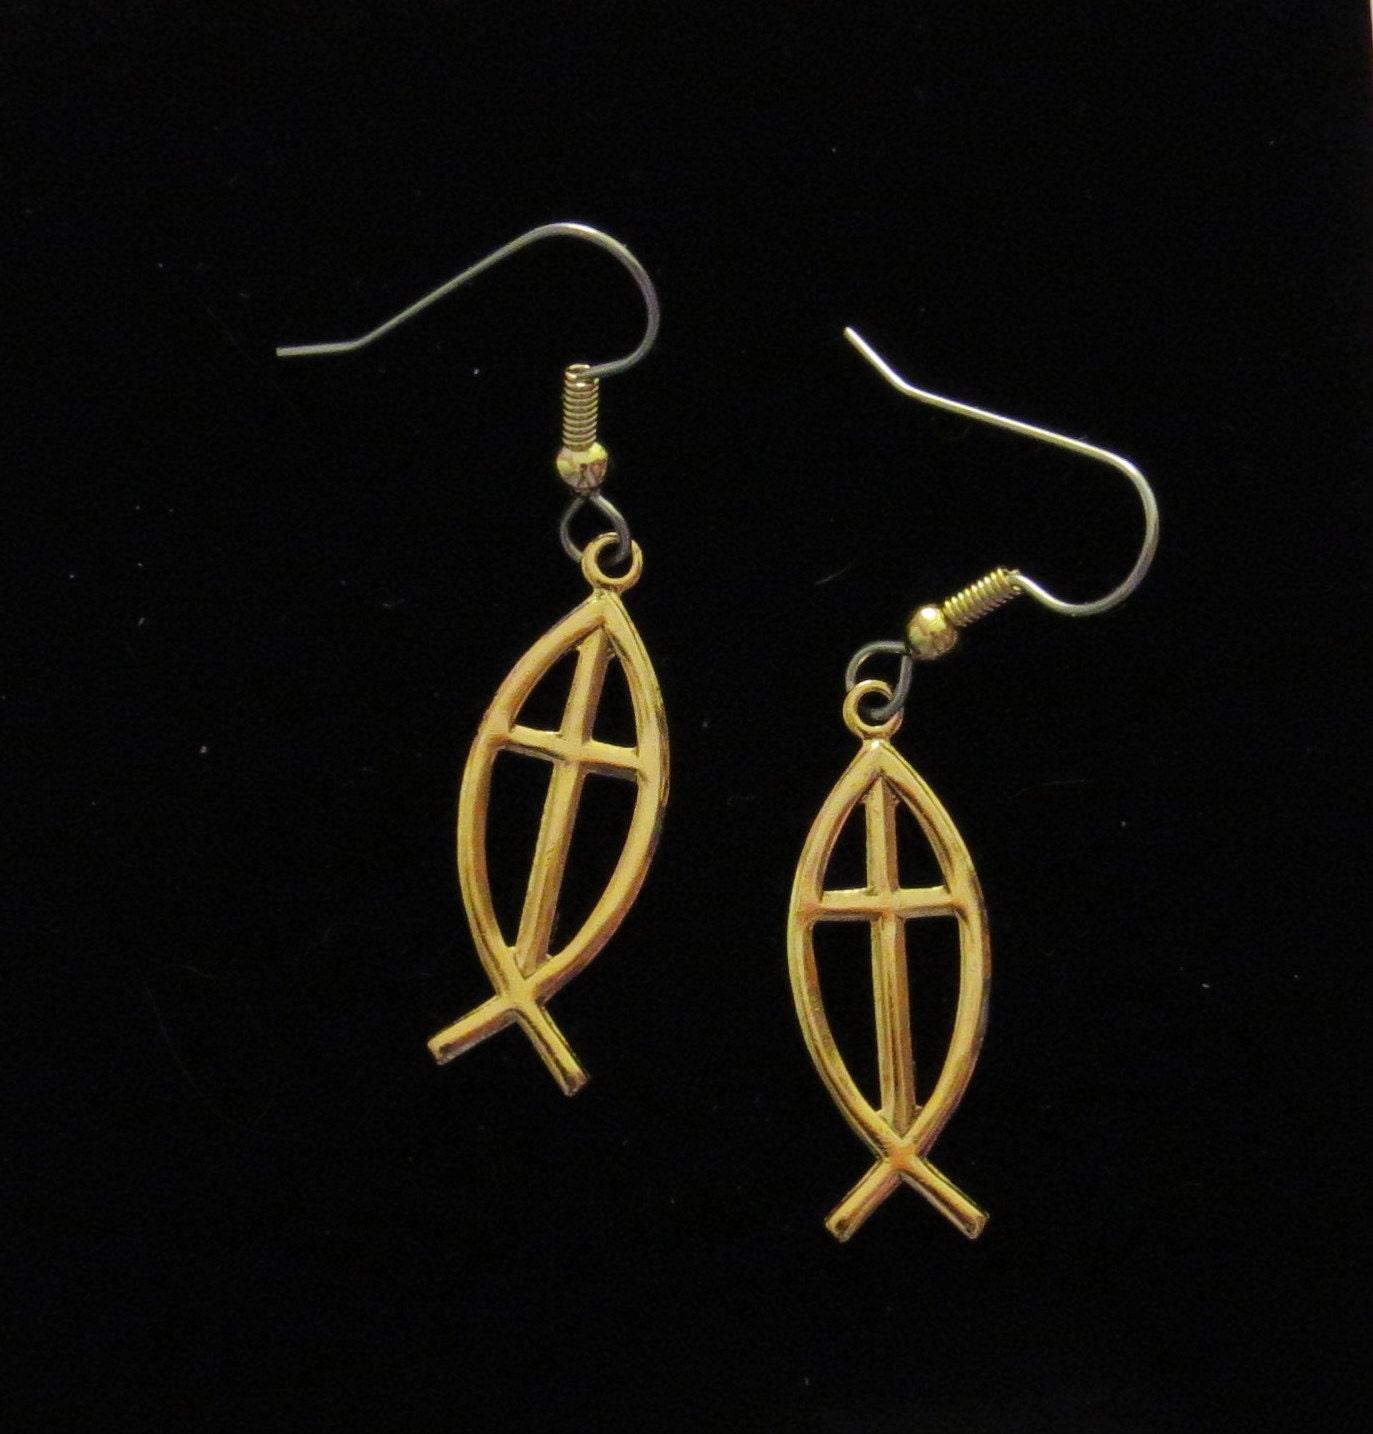 Christian fish symbol with cross earrings 24 karat gold plate description christian fish symbol earrings biocorpaavc Choice Image